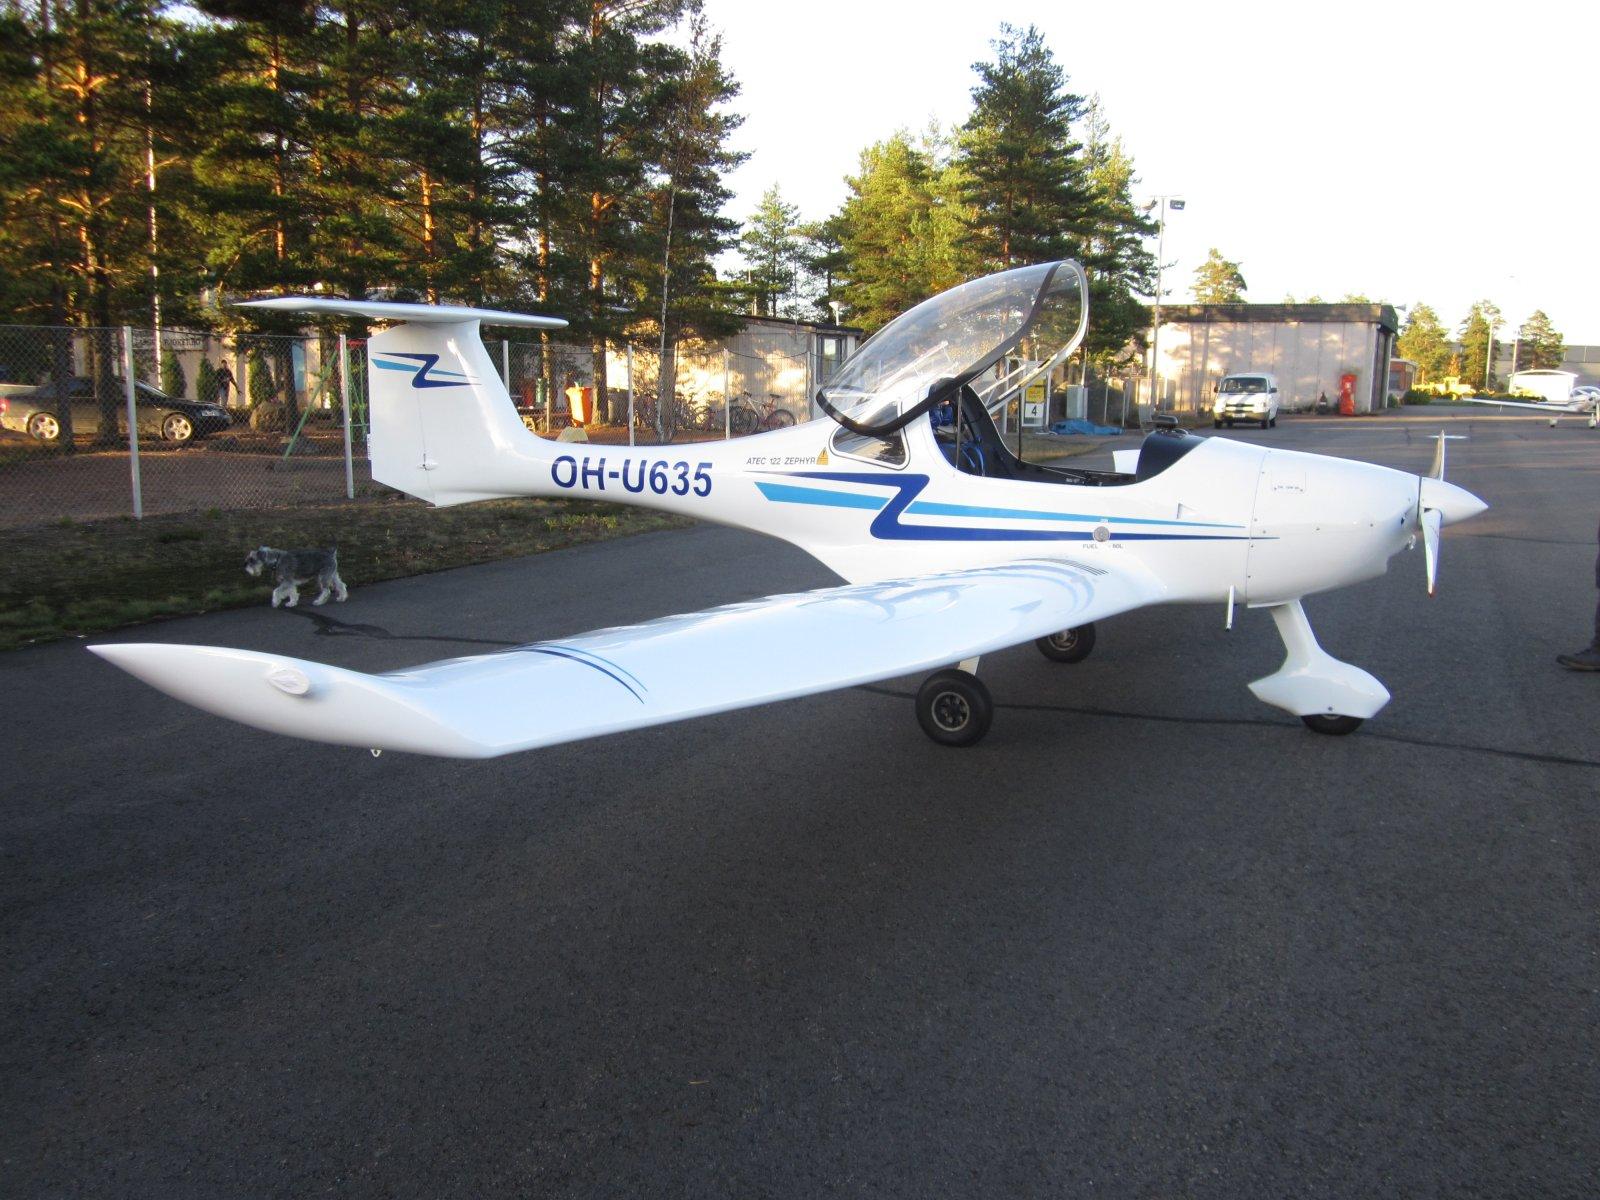 ATEC 122 Zephyr OH-U635 EFUT2012-10-06